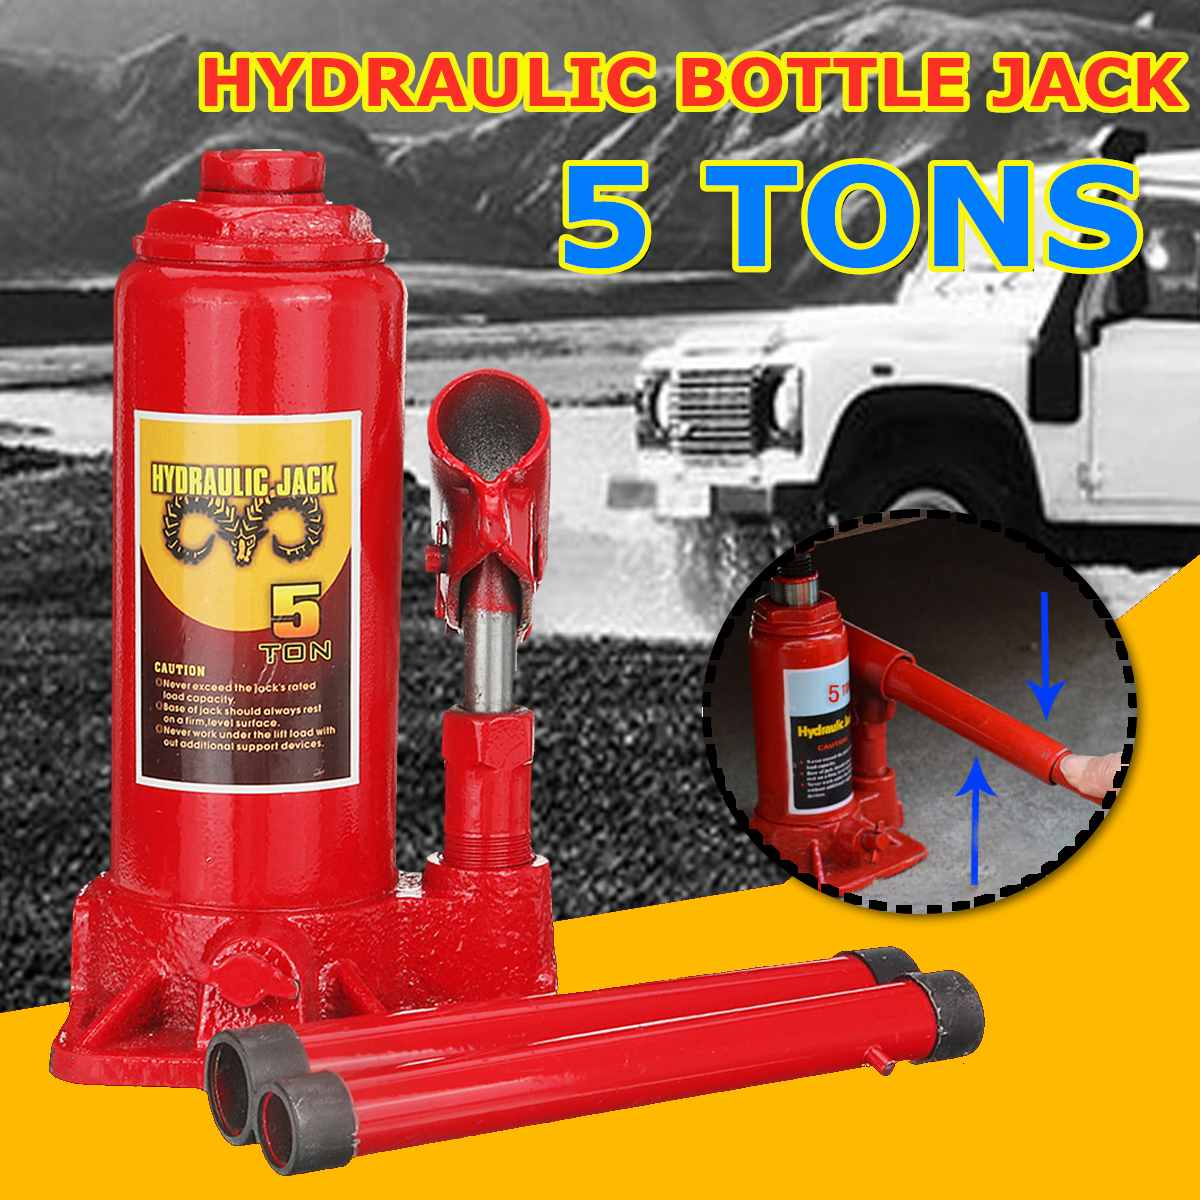 5 Ton Air & Manual Car Hydraulic Bottle Lifting Jack Automotive Car Lifting-Jack For Truck SUV 4WD Caravan Tractor Tool